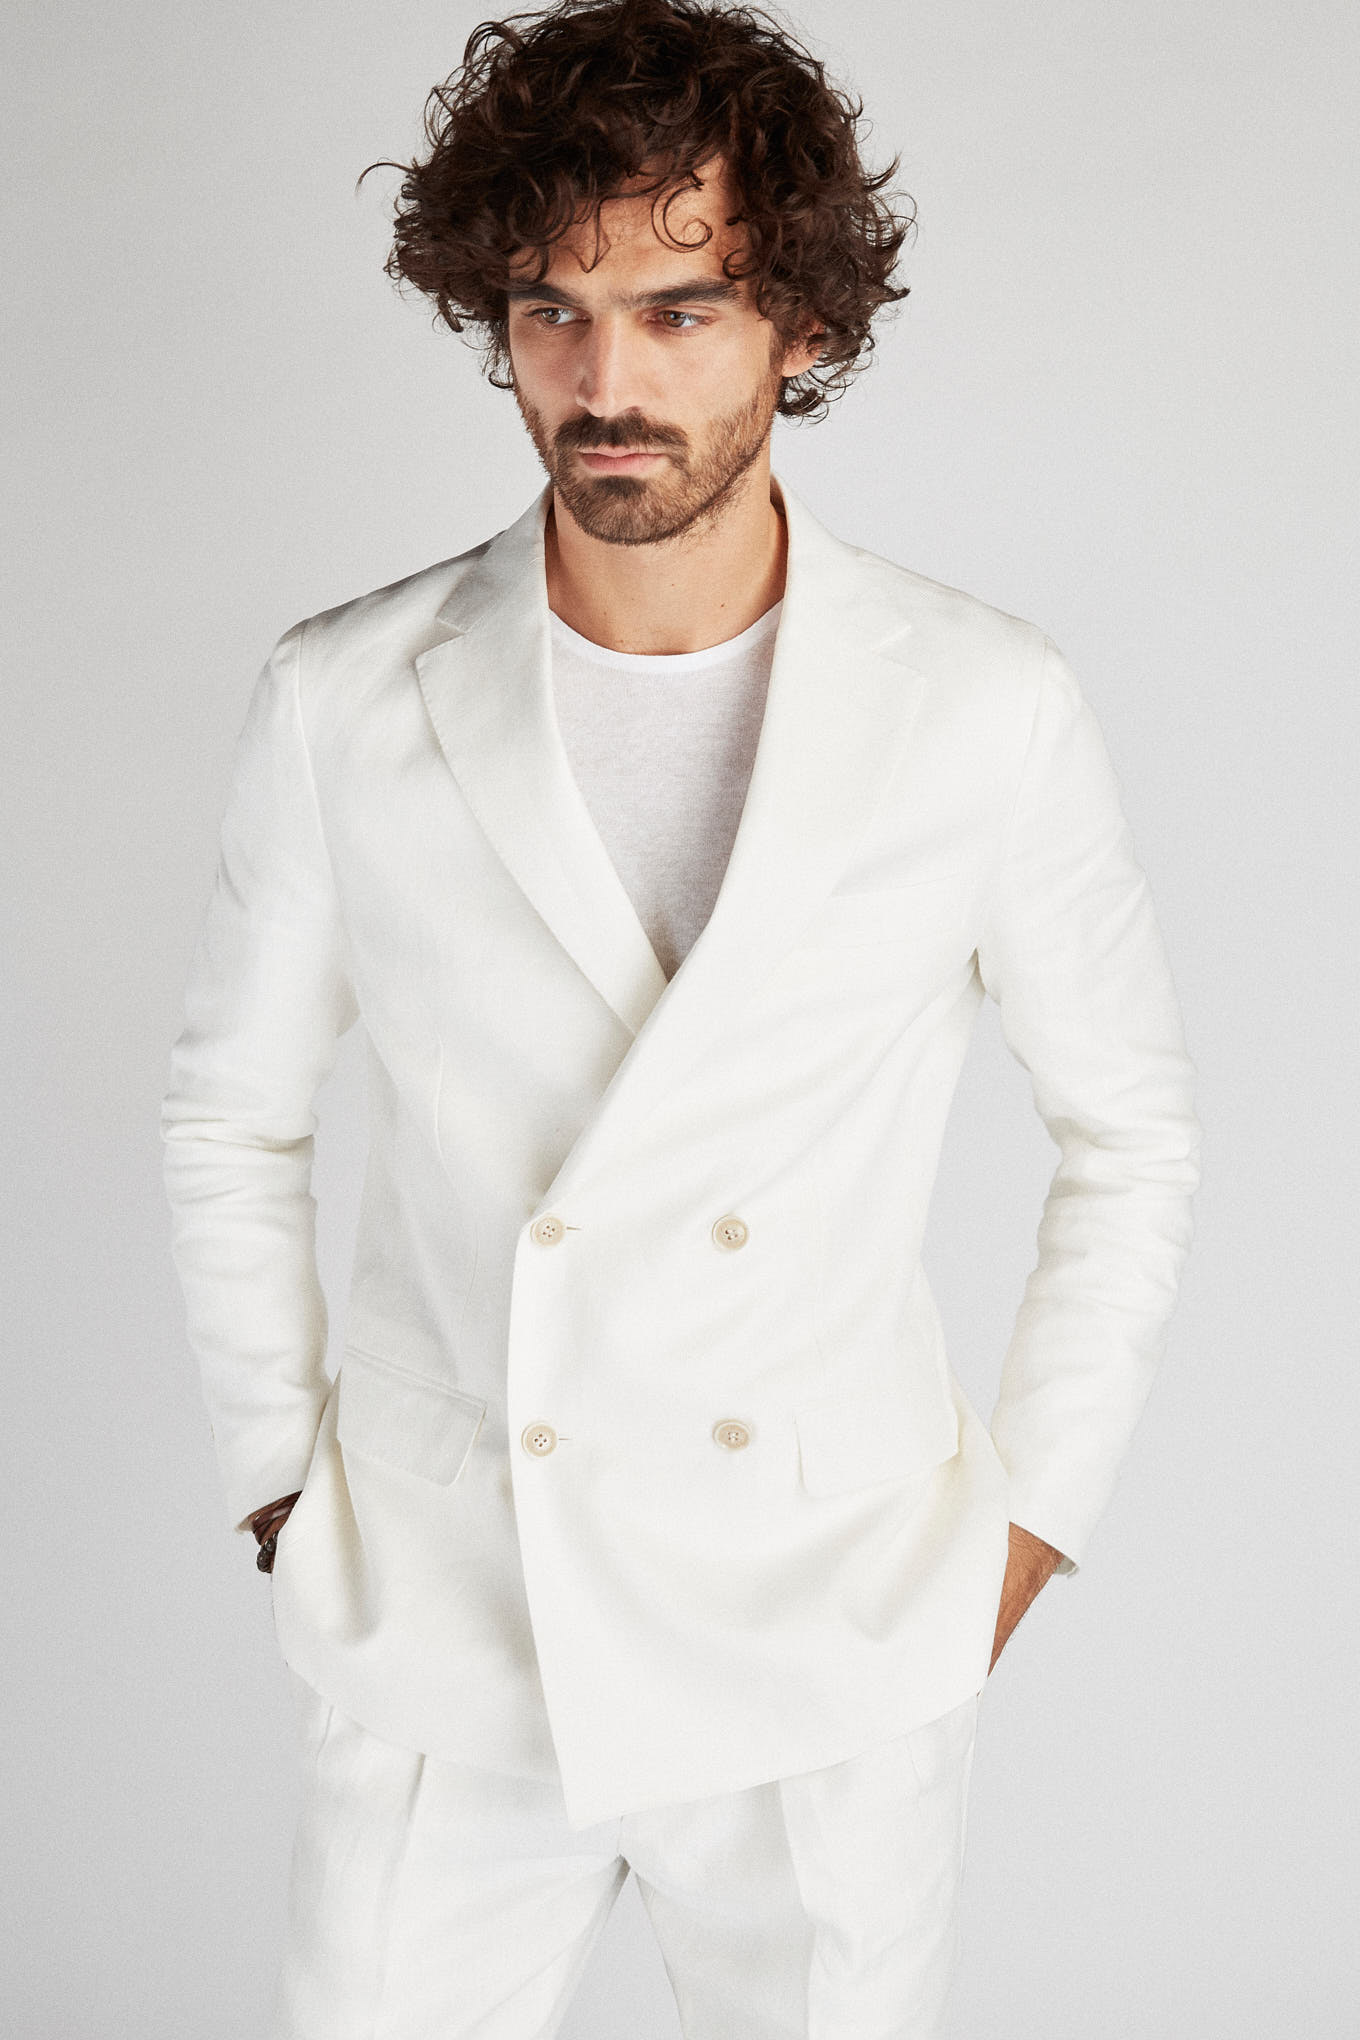 Blazer Branco Classic Homem